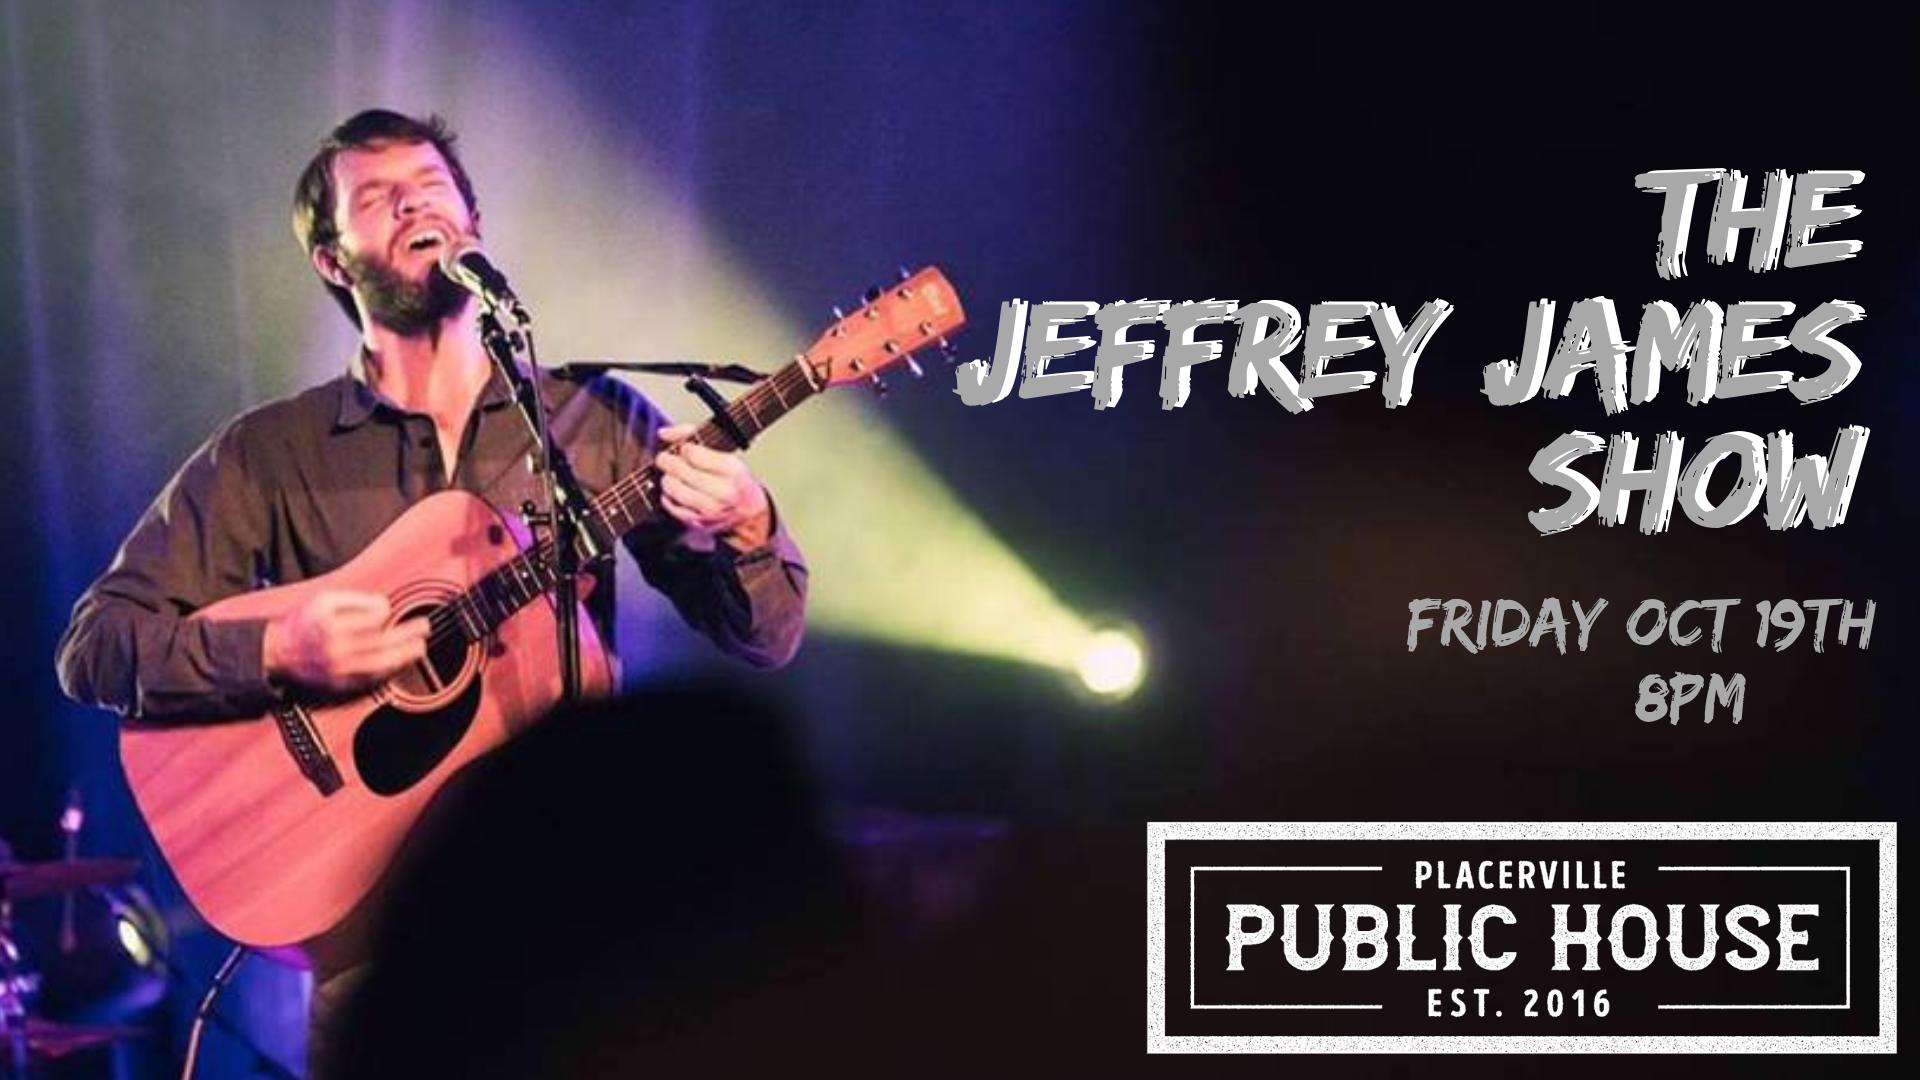 The Jeffrey James Show.png